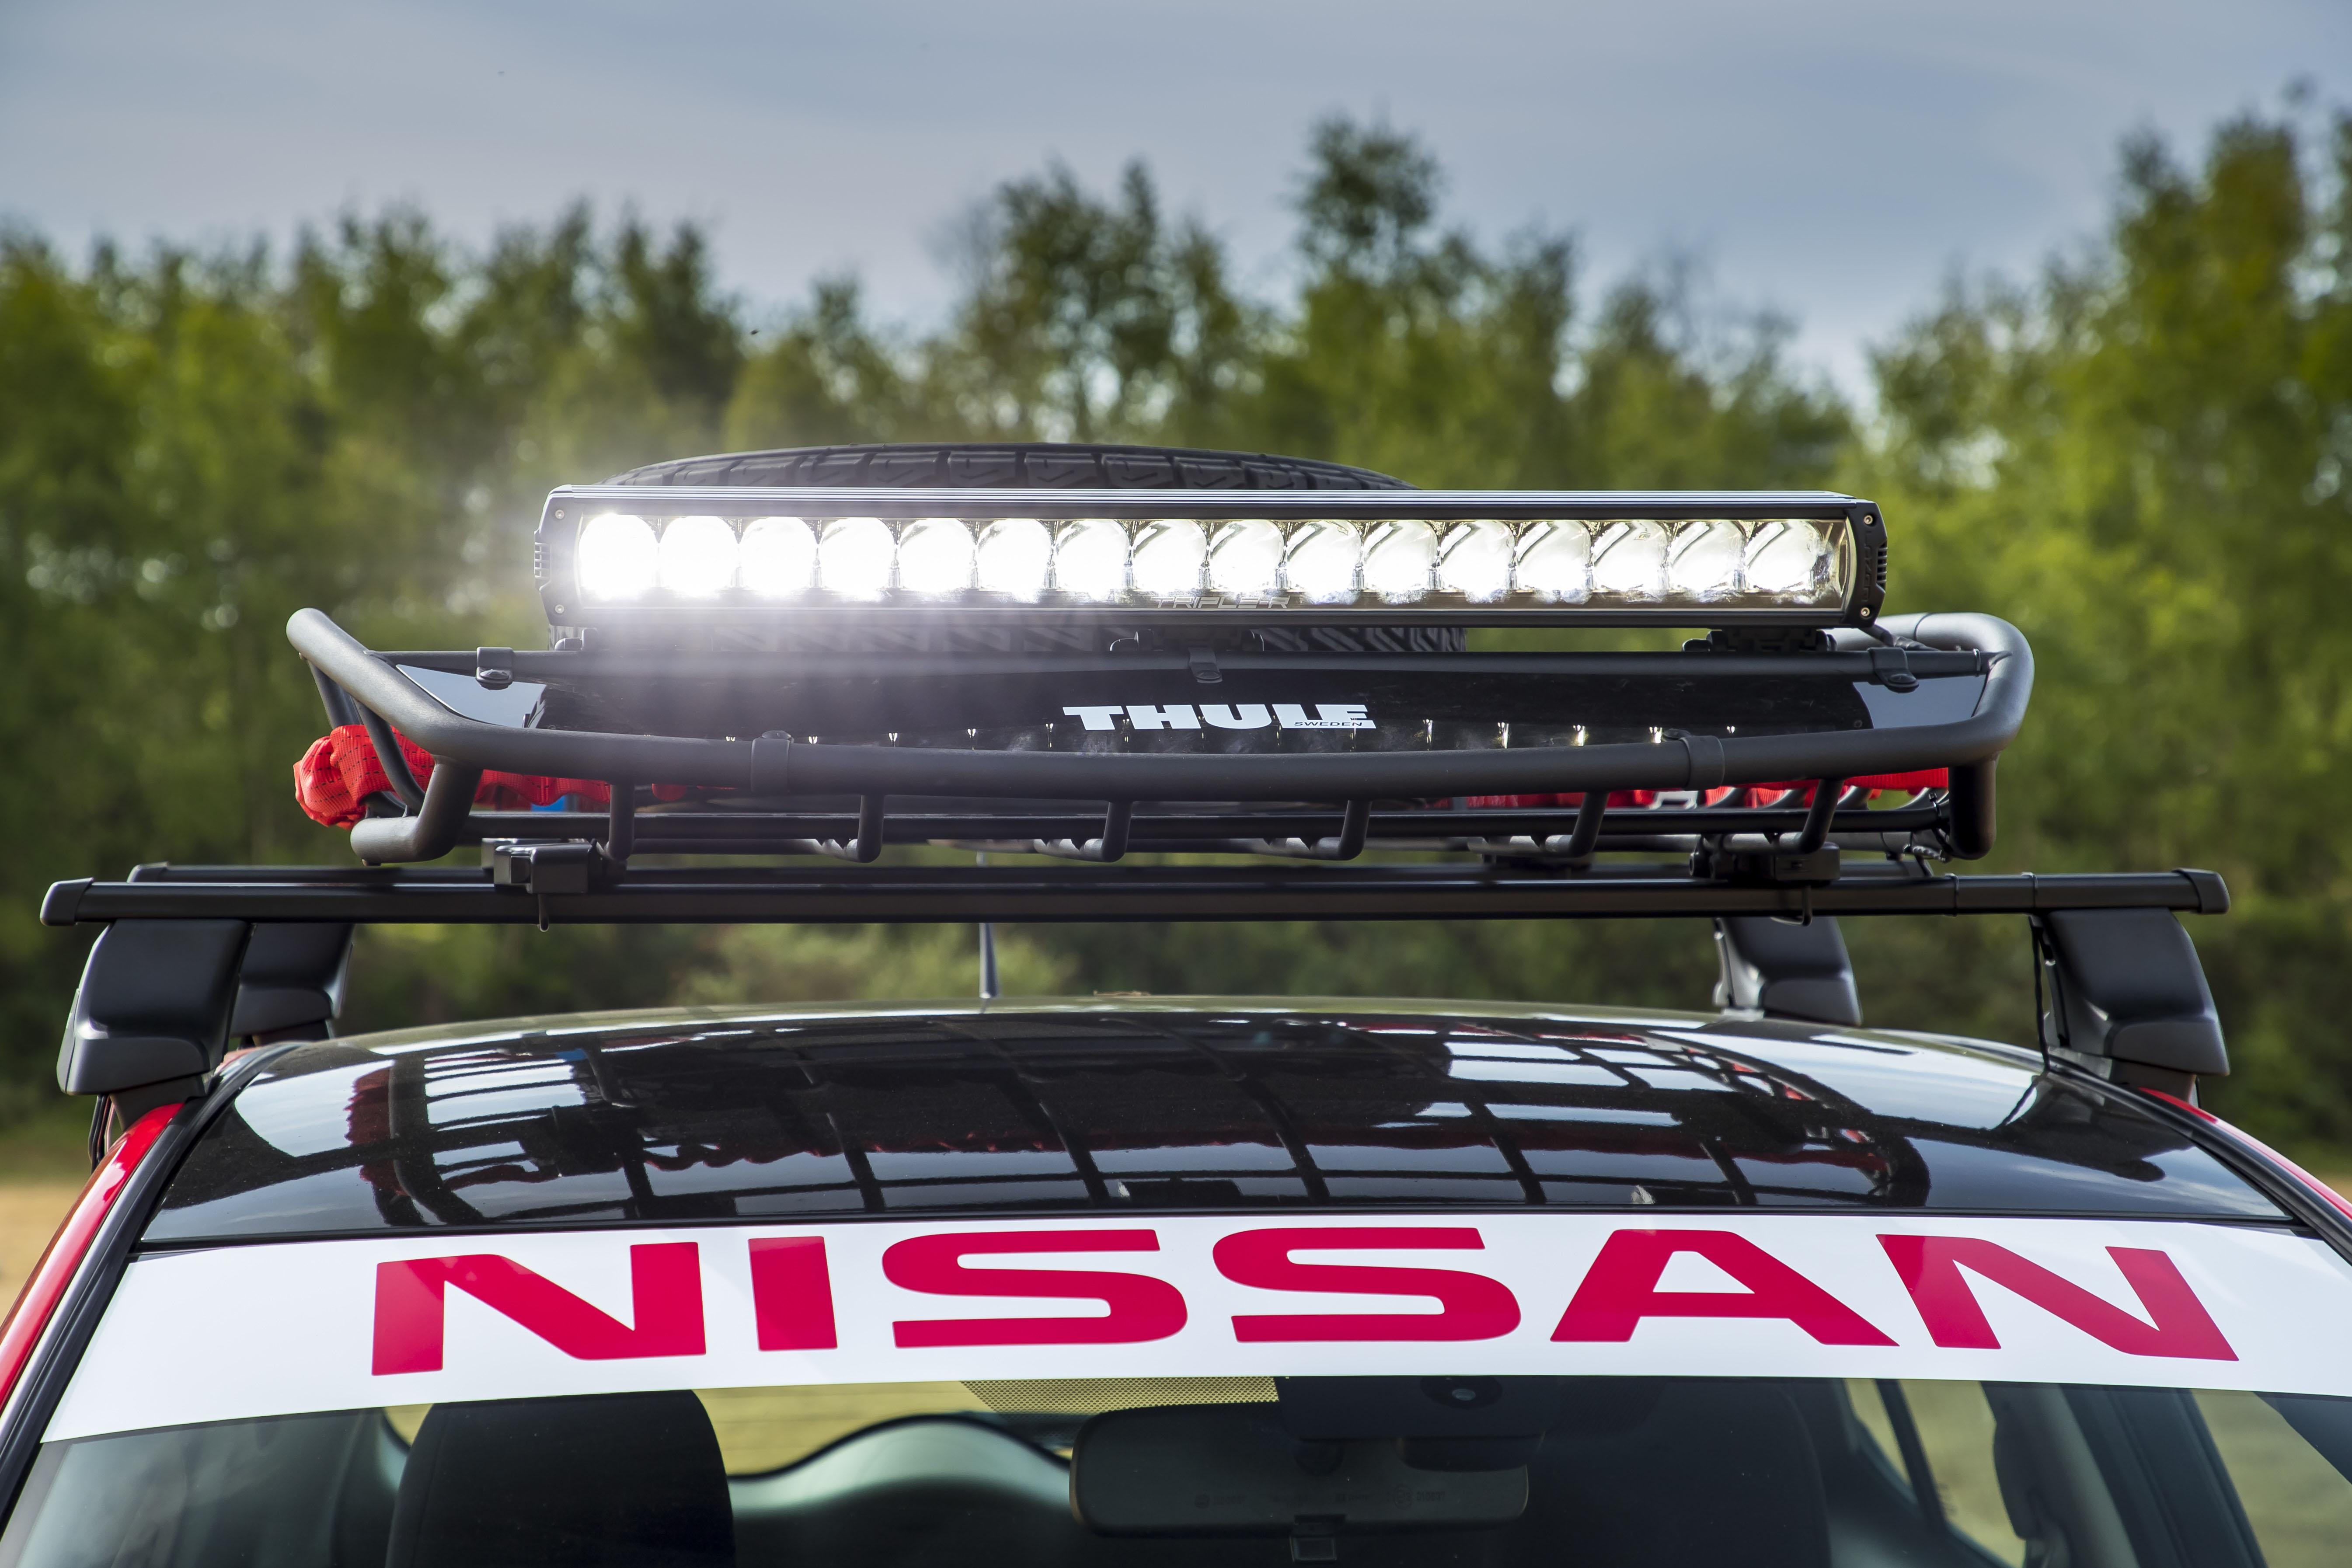 Nissan Leaf Mongol Rally lightbar